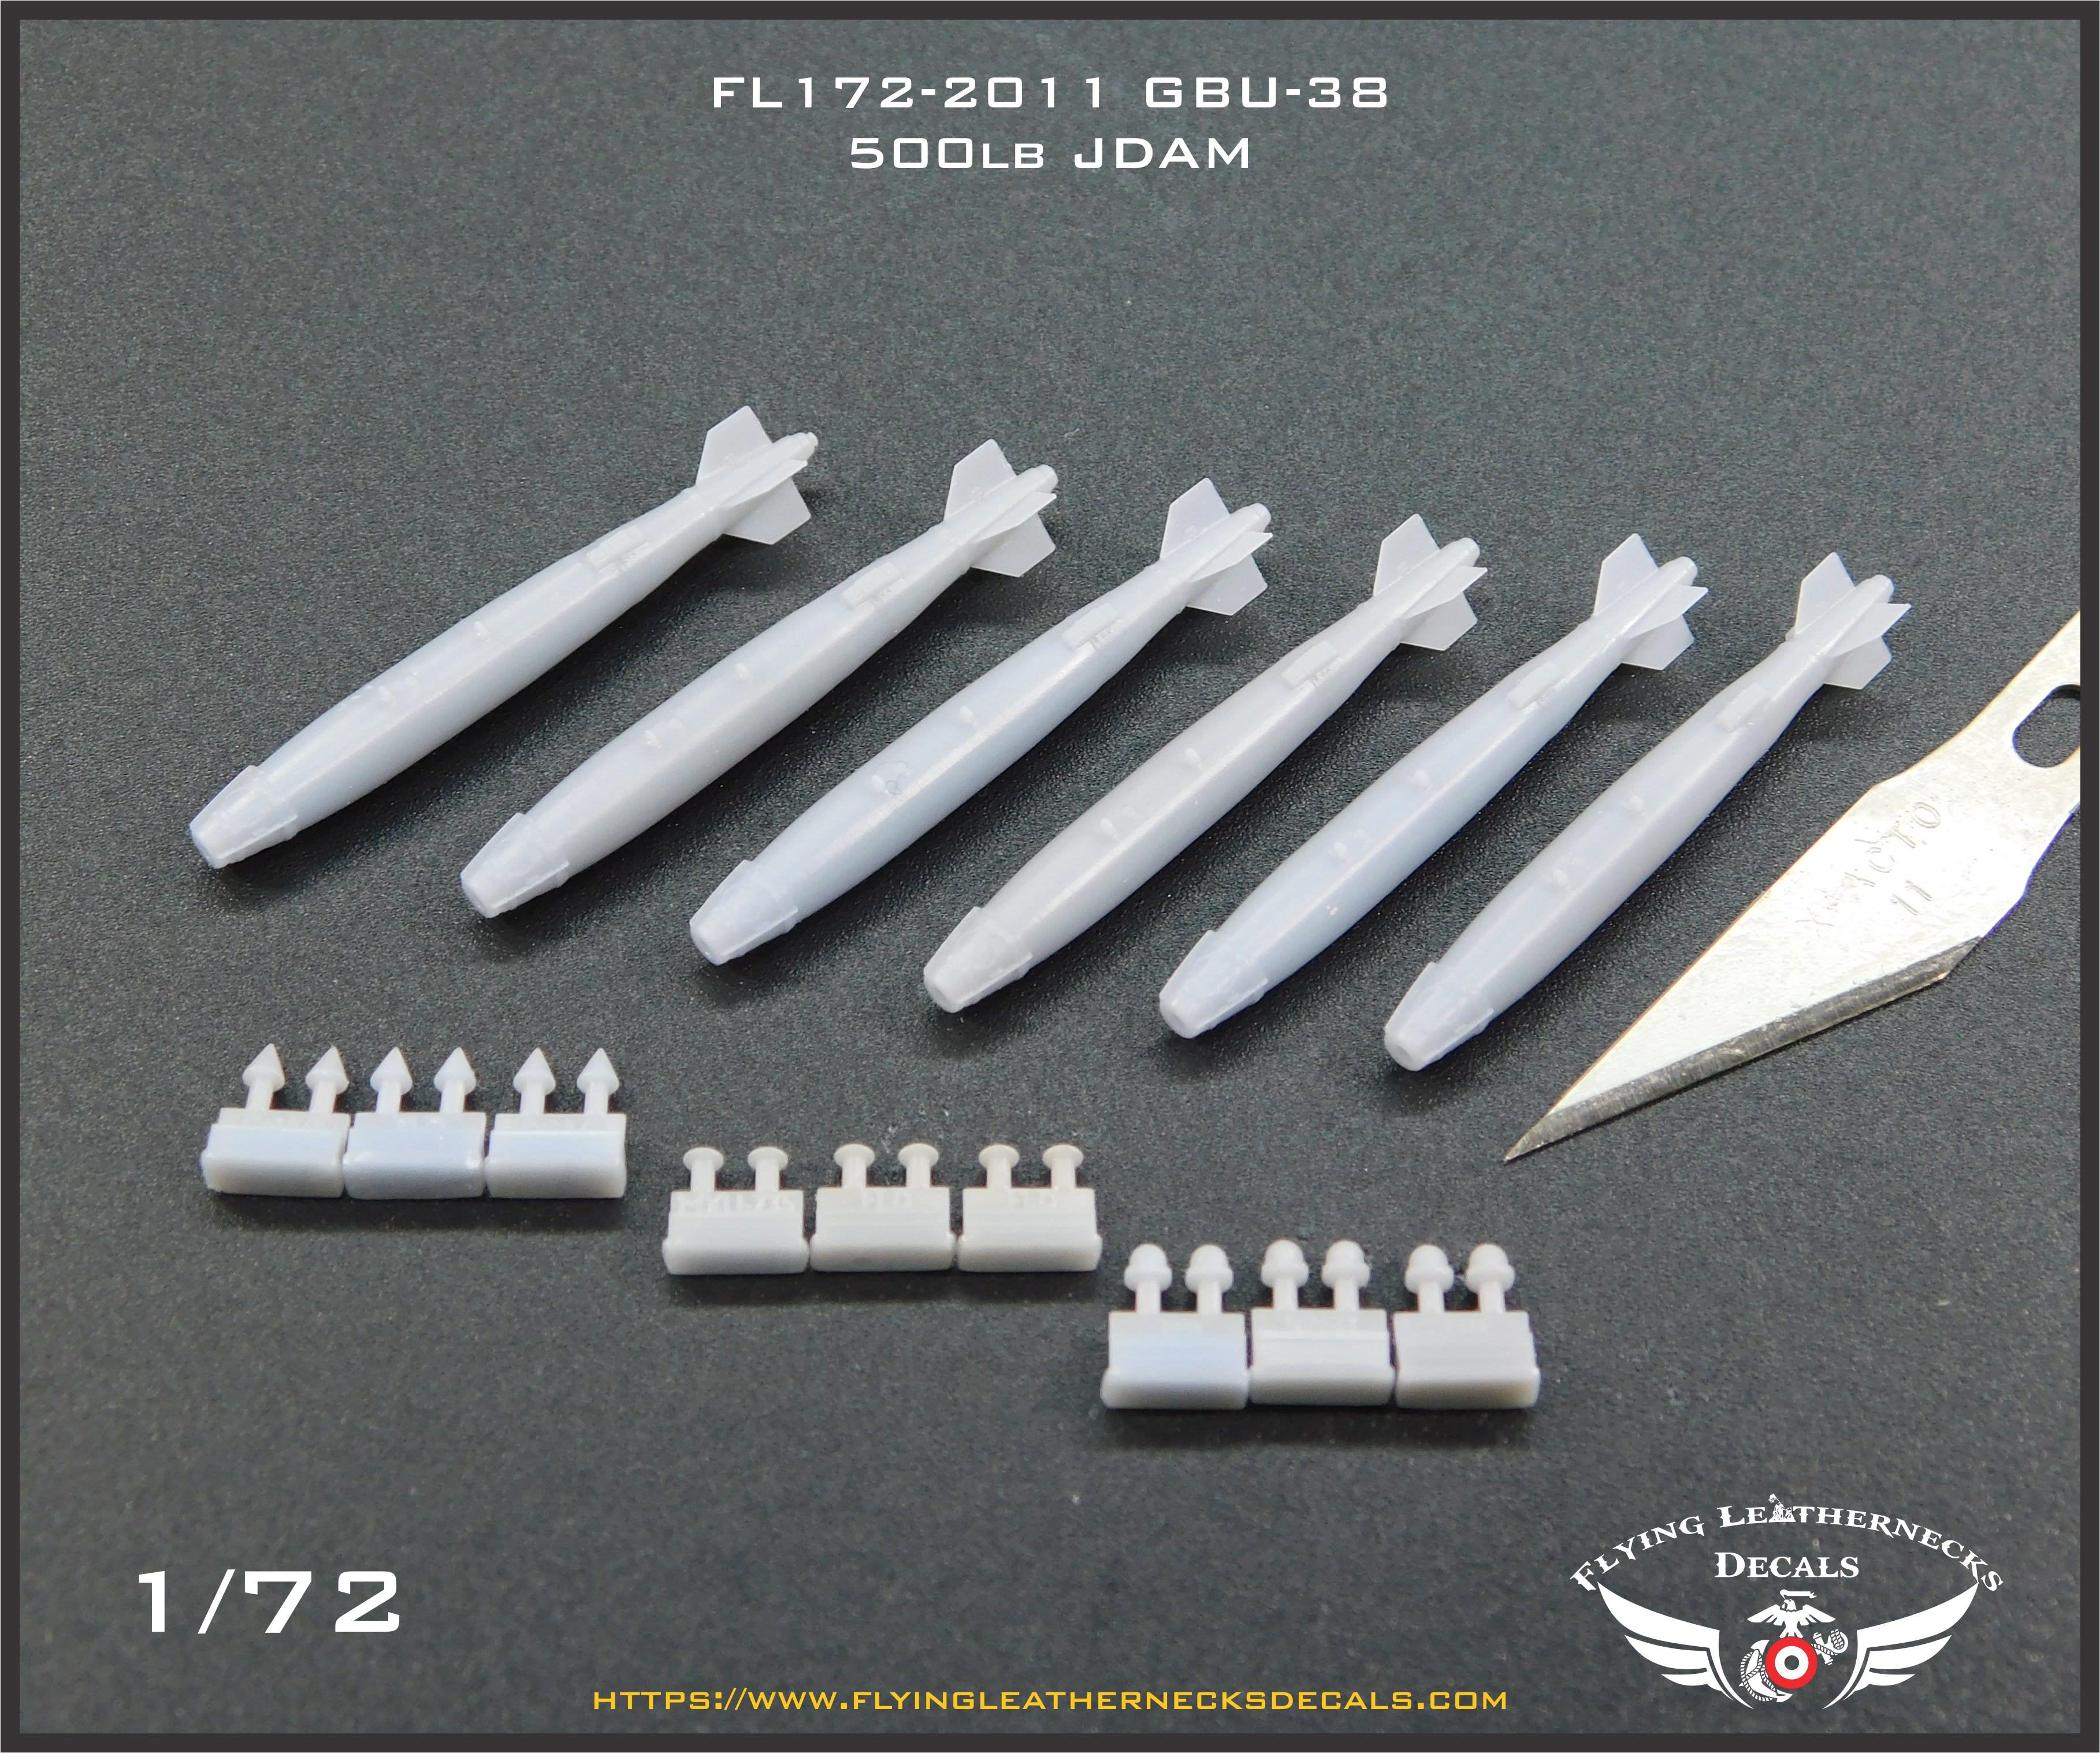 FL172-2011